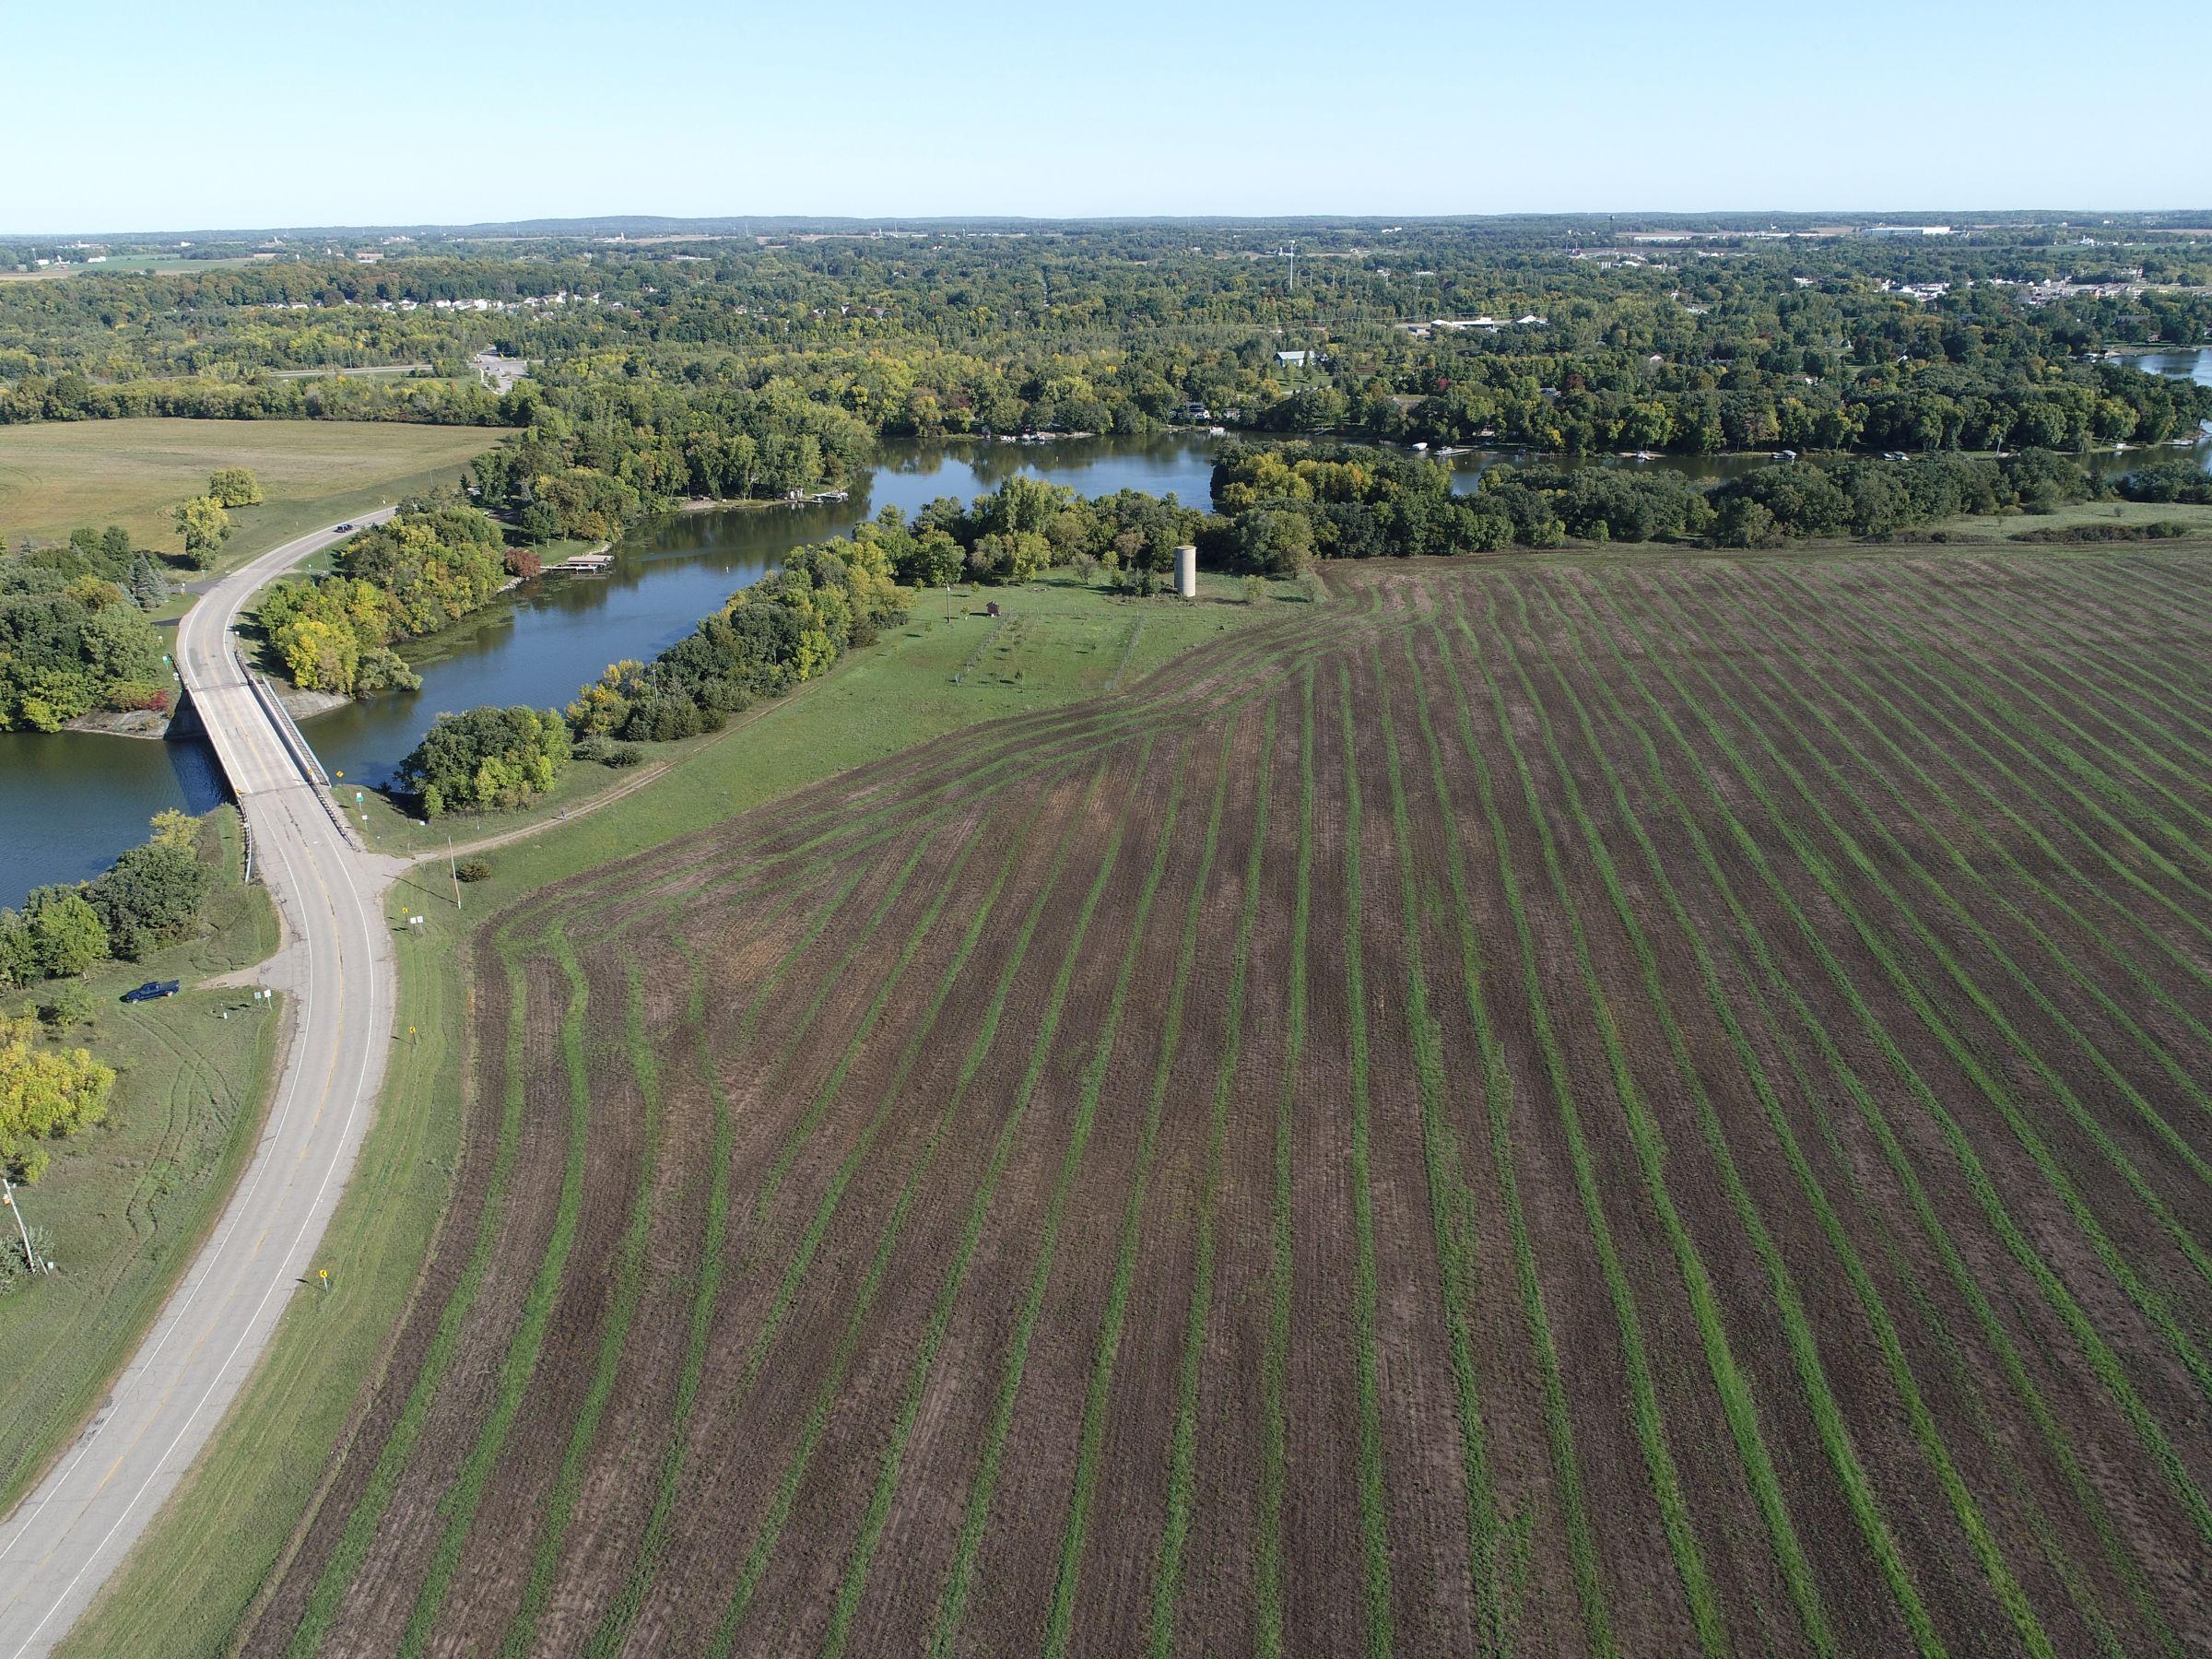 land-stearns-county-minnesota-298-acres-listing-number-15712-0-2021-09-23-123752.JPG